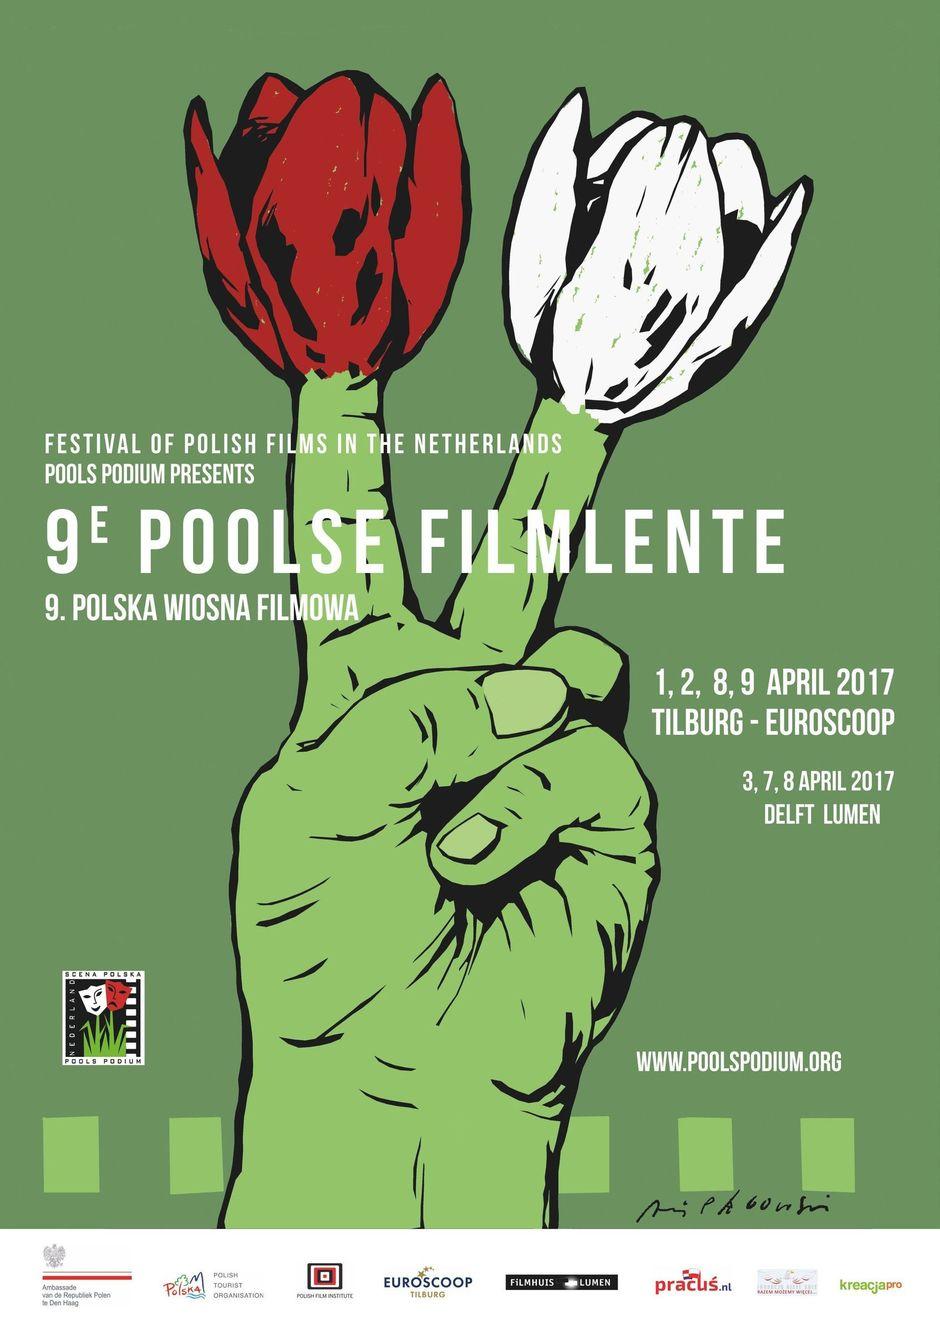 poster_Poolse_Filmlente_2017.6d09ad6b